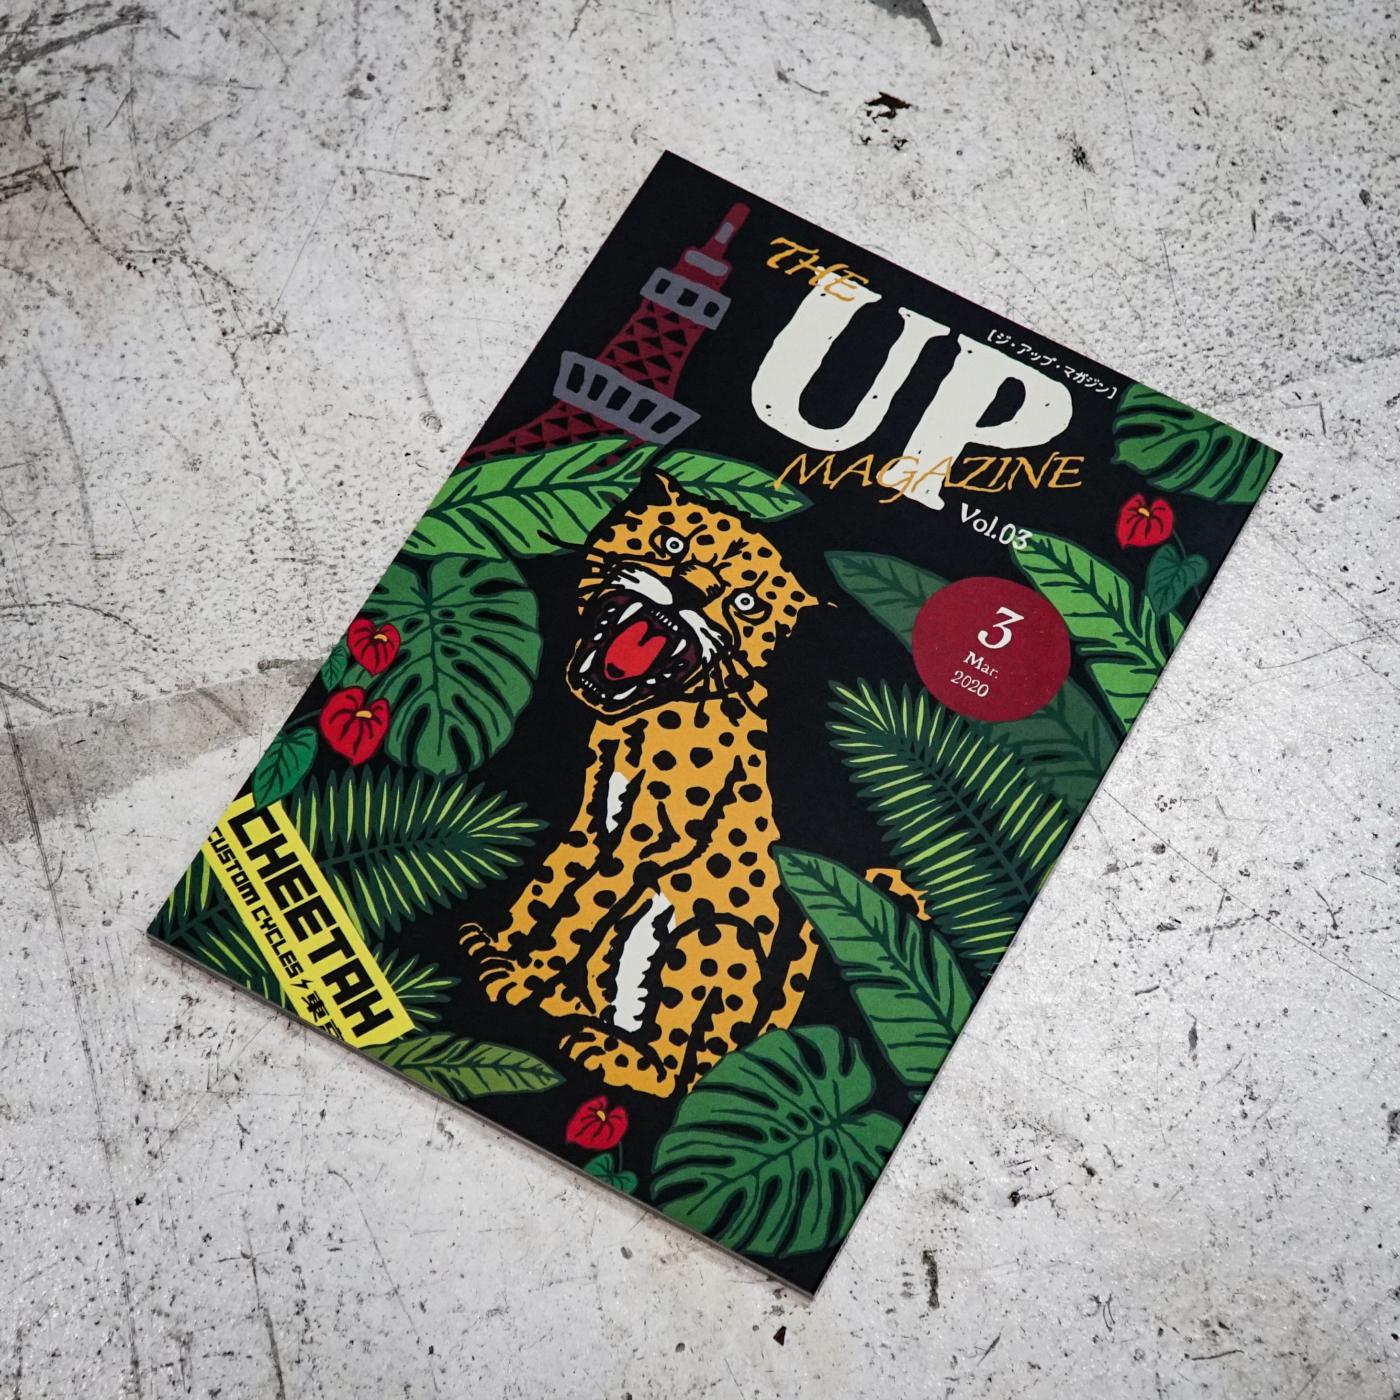 THE UP MAGAZINE Vol.3